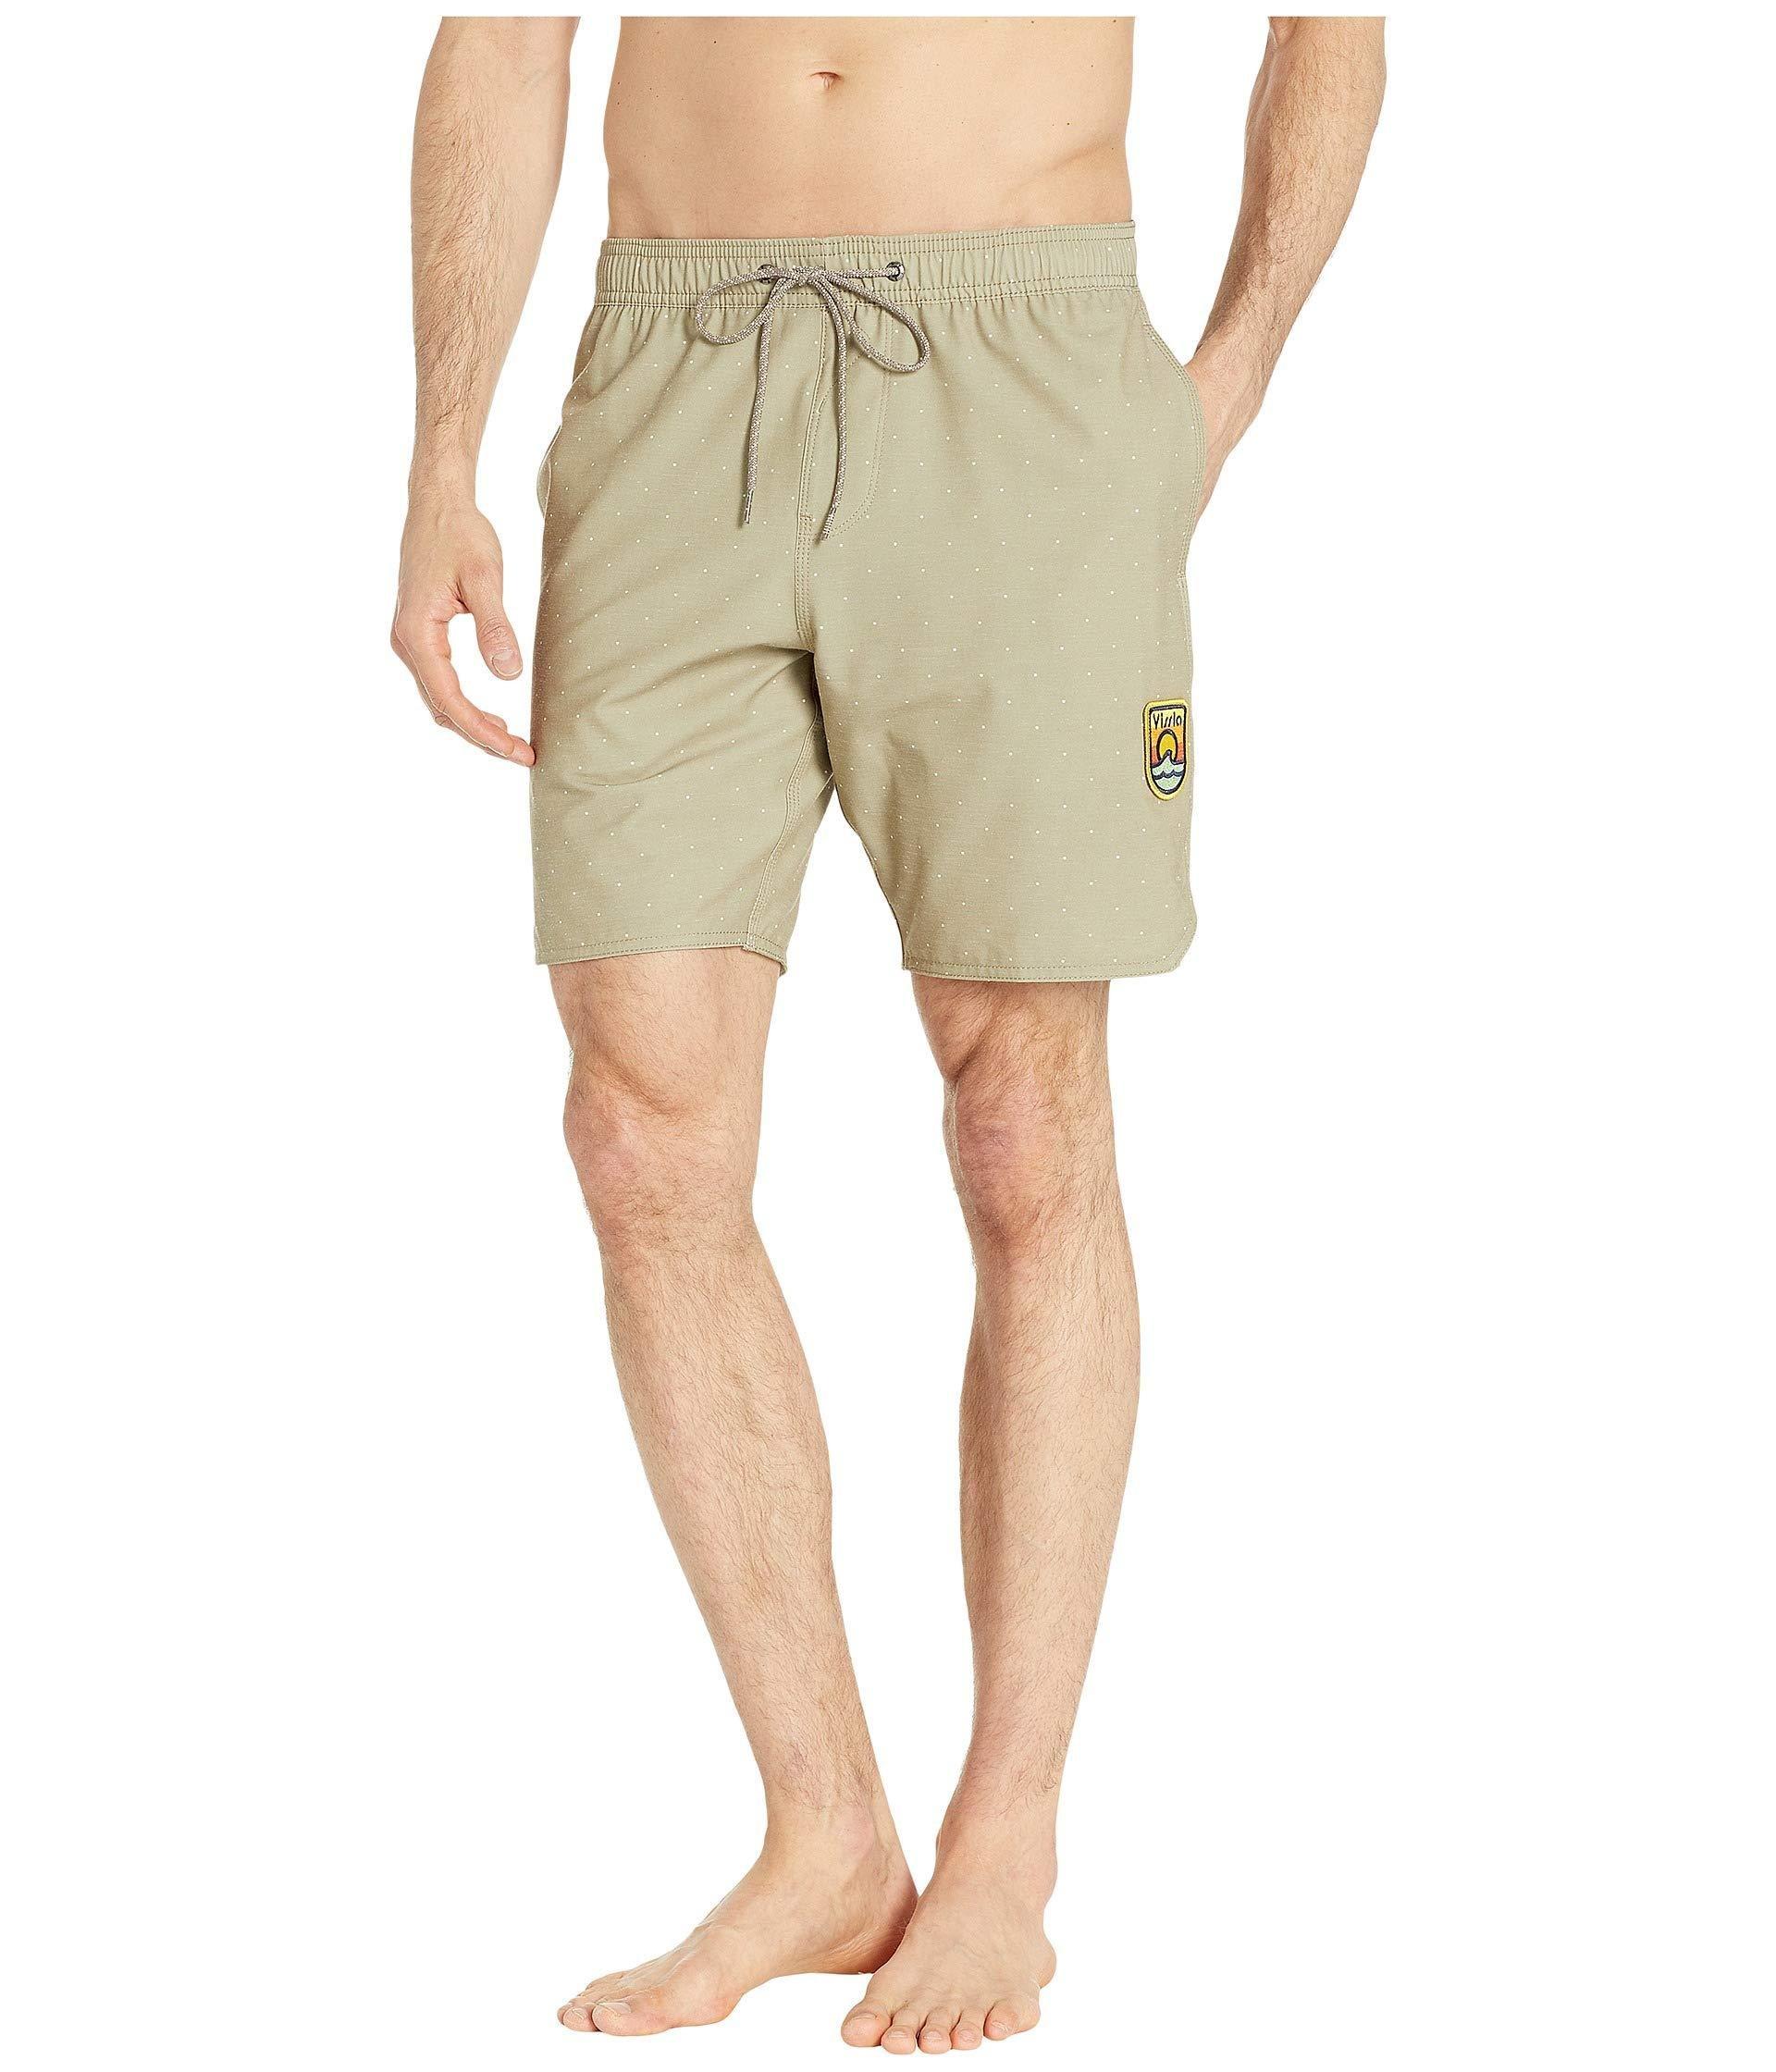 b2563b02 Vissla 17.5 Solid Sets Printed Ecolastic (khaki) Men's Swimwear in ...